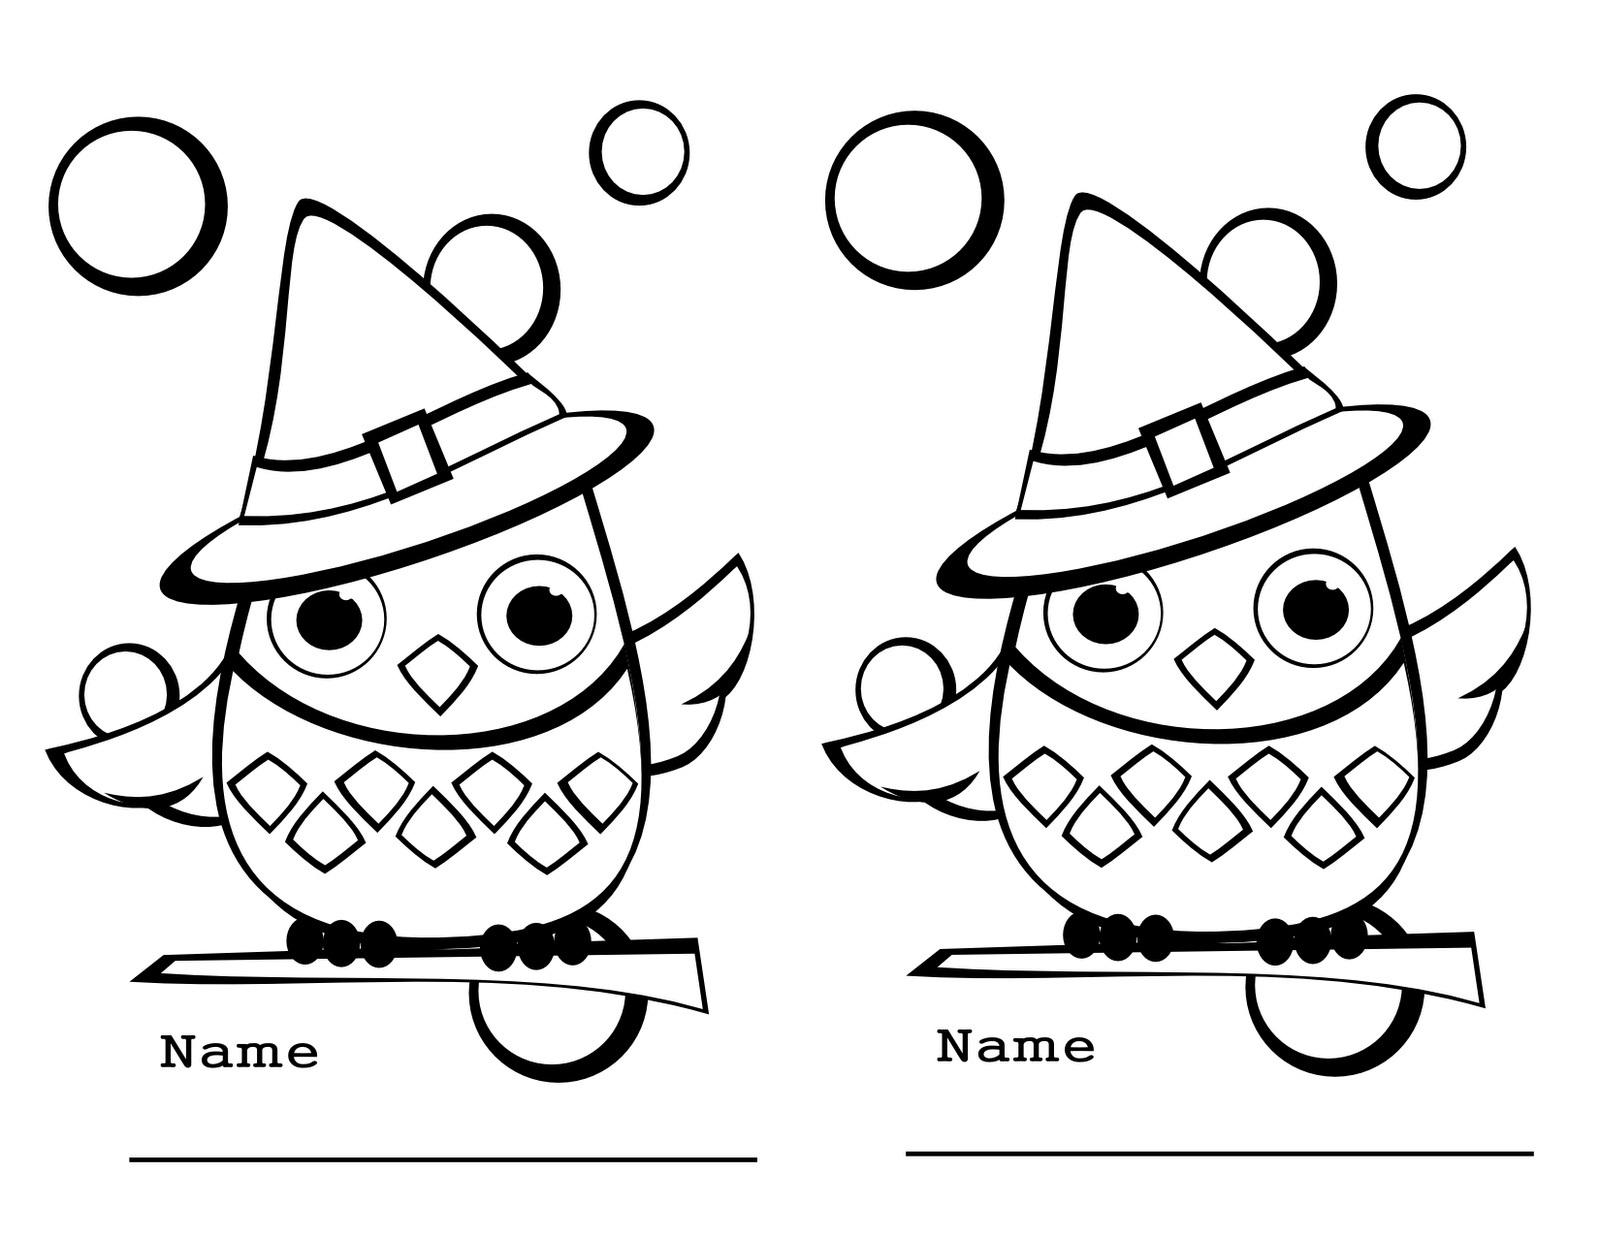 coloring books for kindergarten printable kindergarten coloring pages for kids cool2bkids books for coloring kindergarten